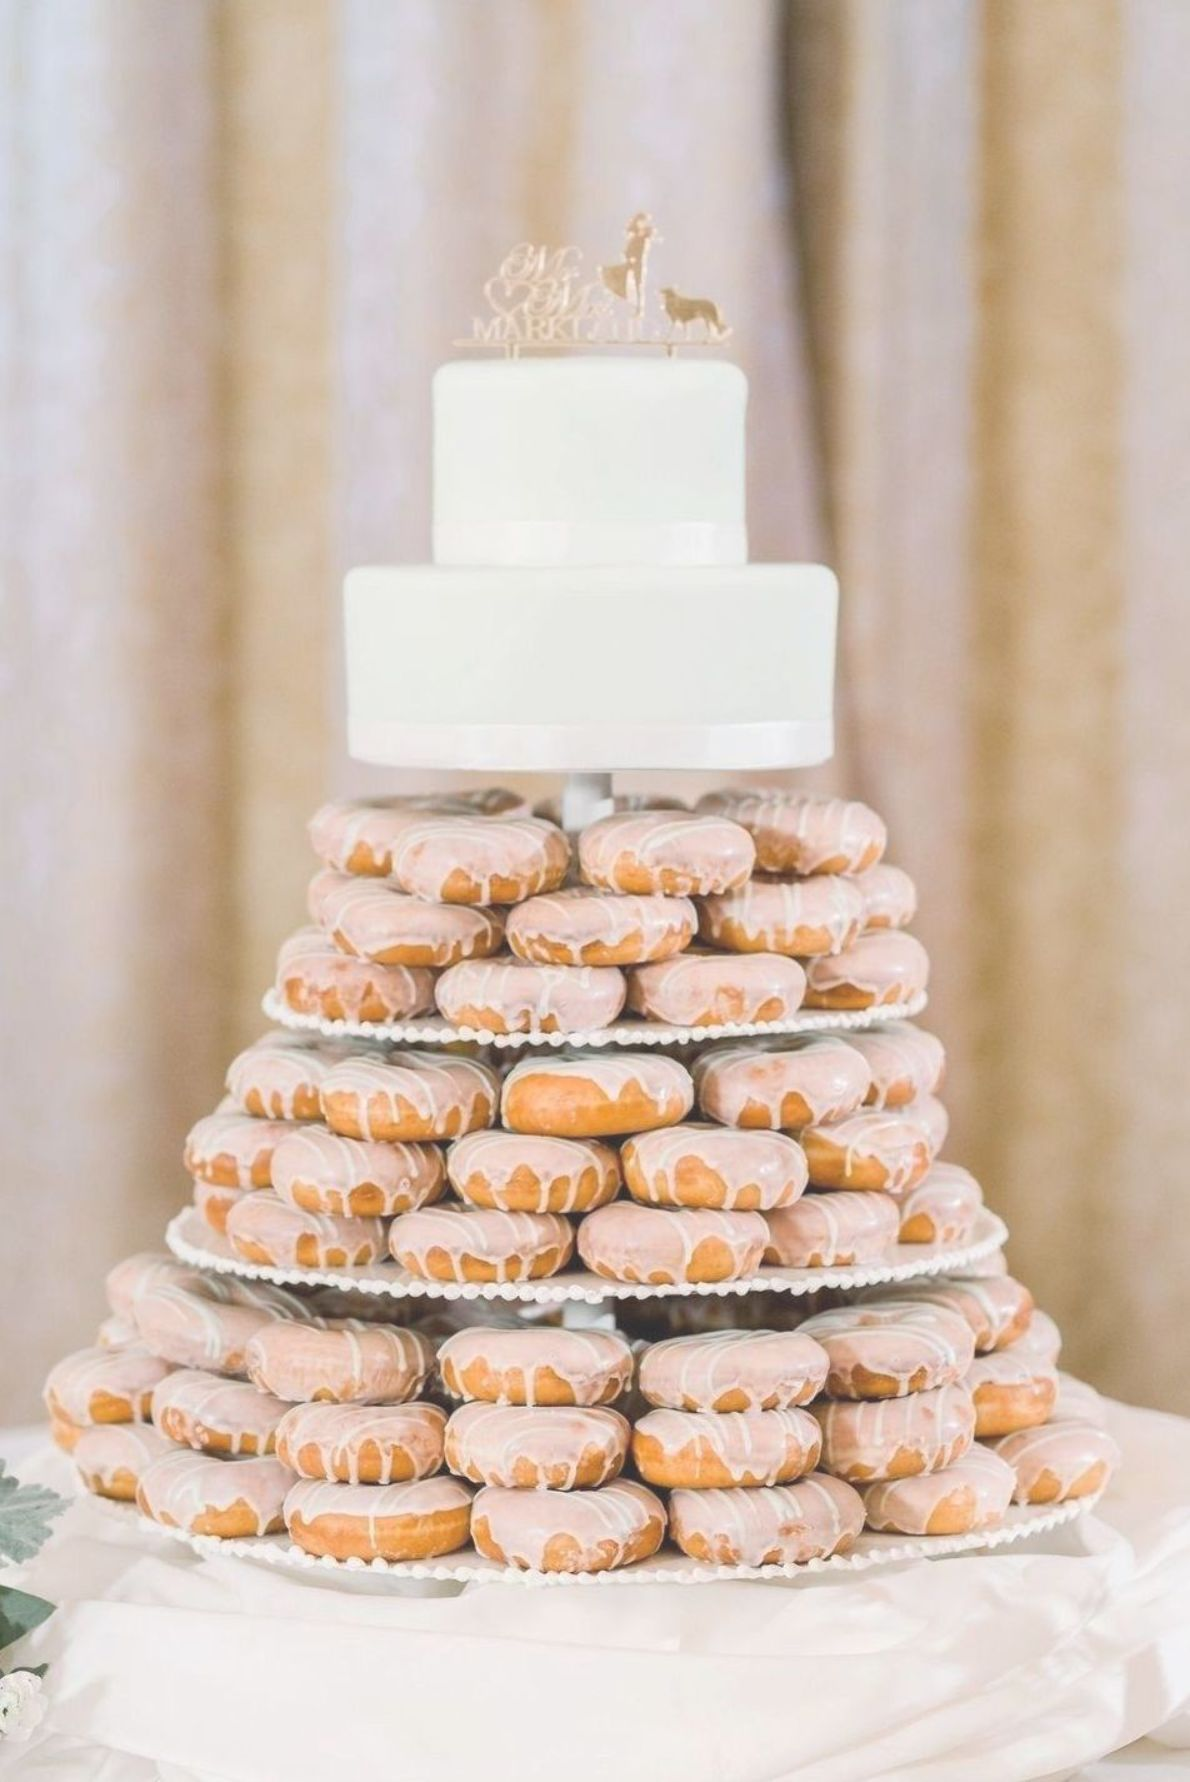 Cute Wedding Cake Cupcakes Ideas 52 Hochzeitstorte Cupcakes